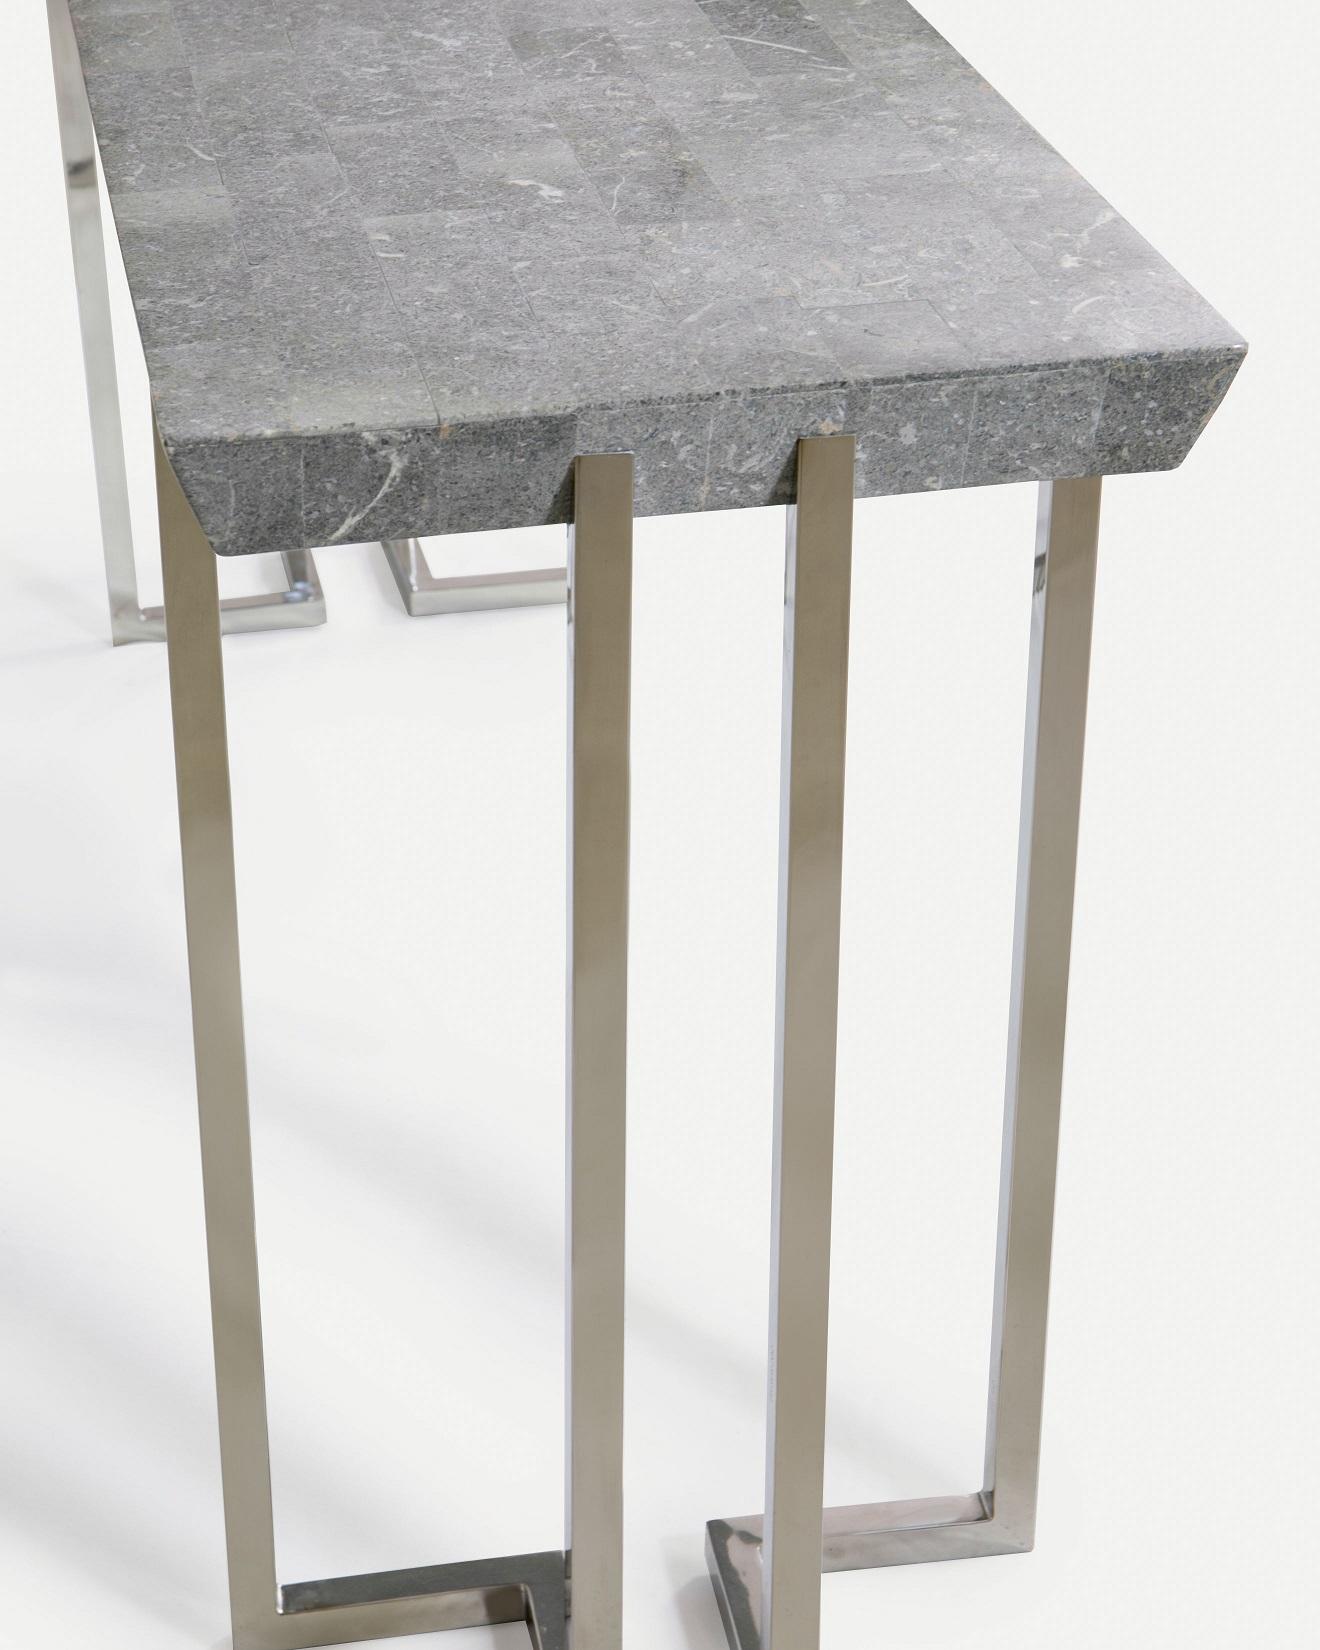 Co-Creative Studio, Detalia Aurora, Ercole Tables, Gray Stone Lamination, Stainless Steel B.jpg